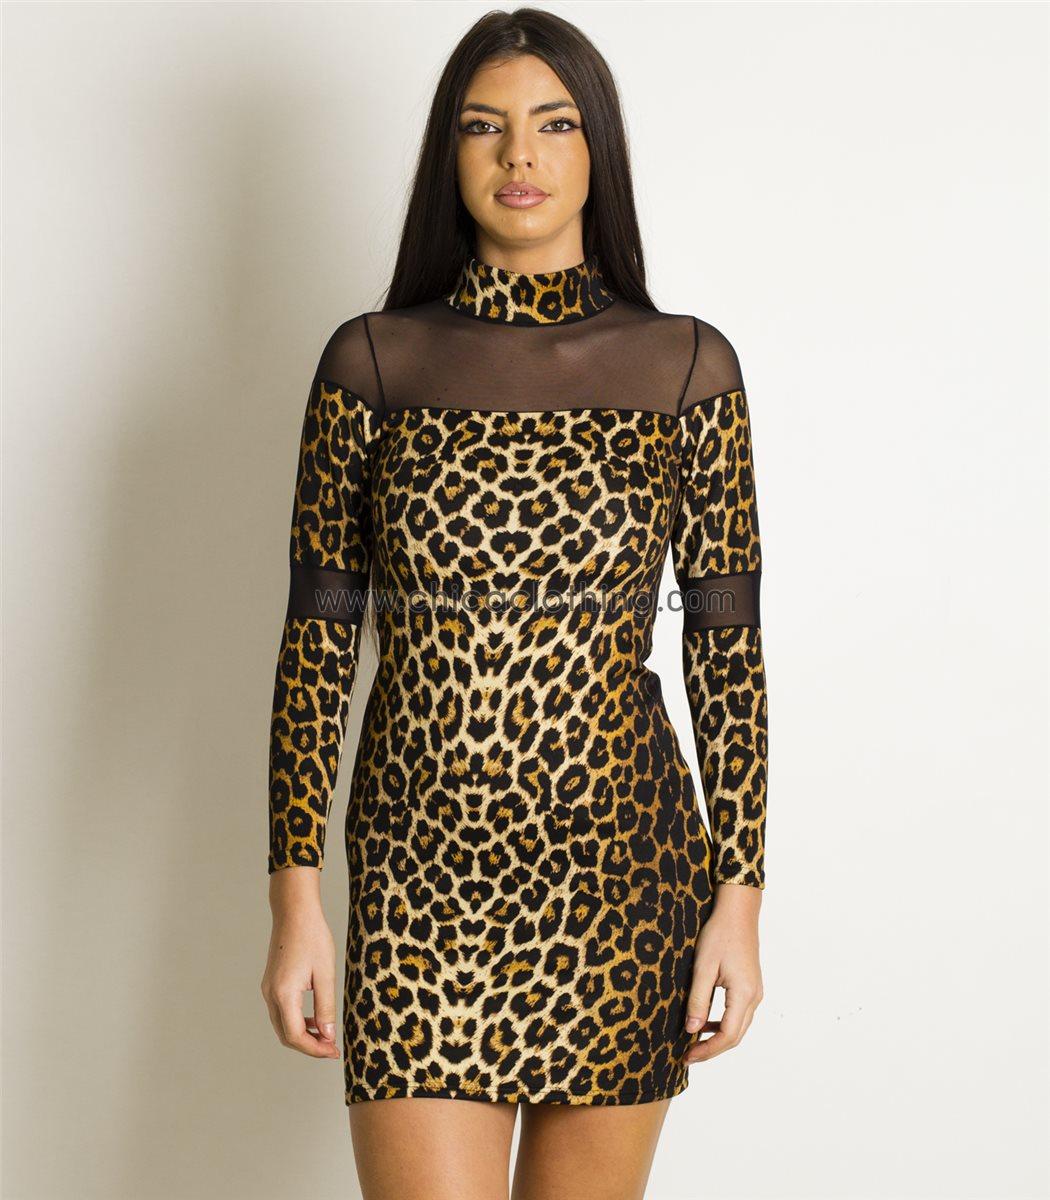 e6793fafb2be Γυναικείο φόρεμα με λωρίδες διαφάνεια (Λεοπάρ)